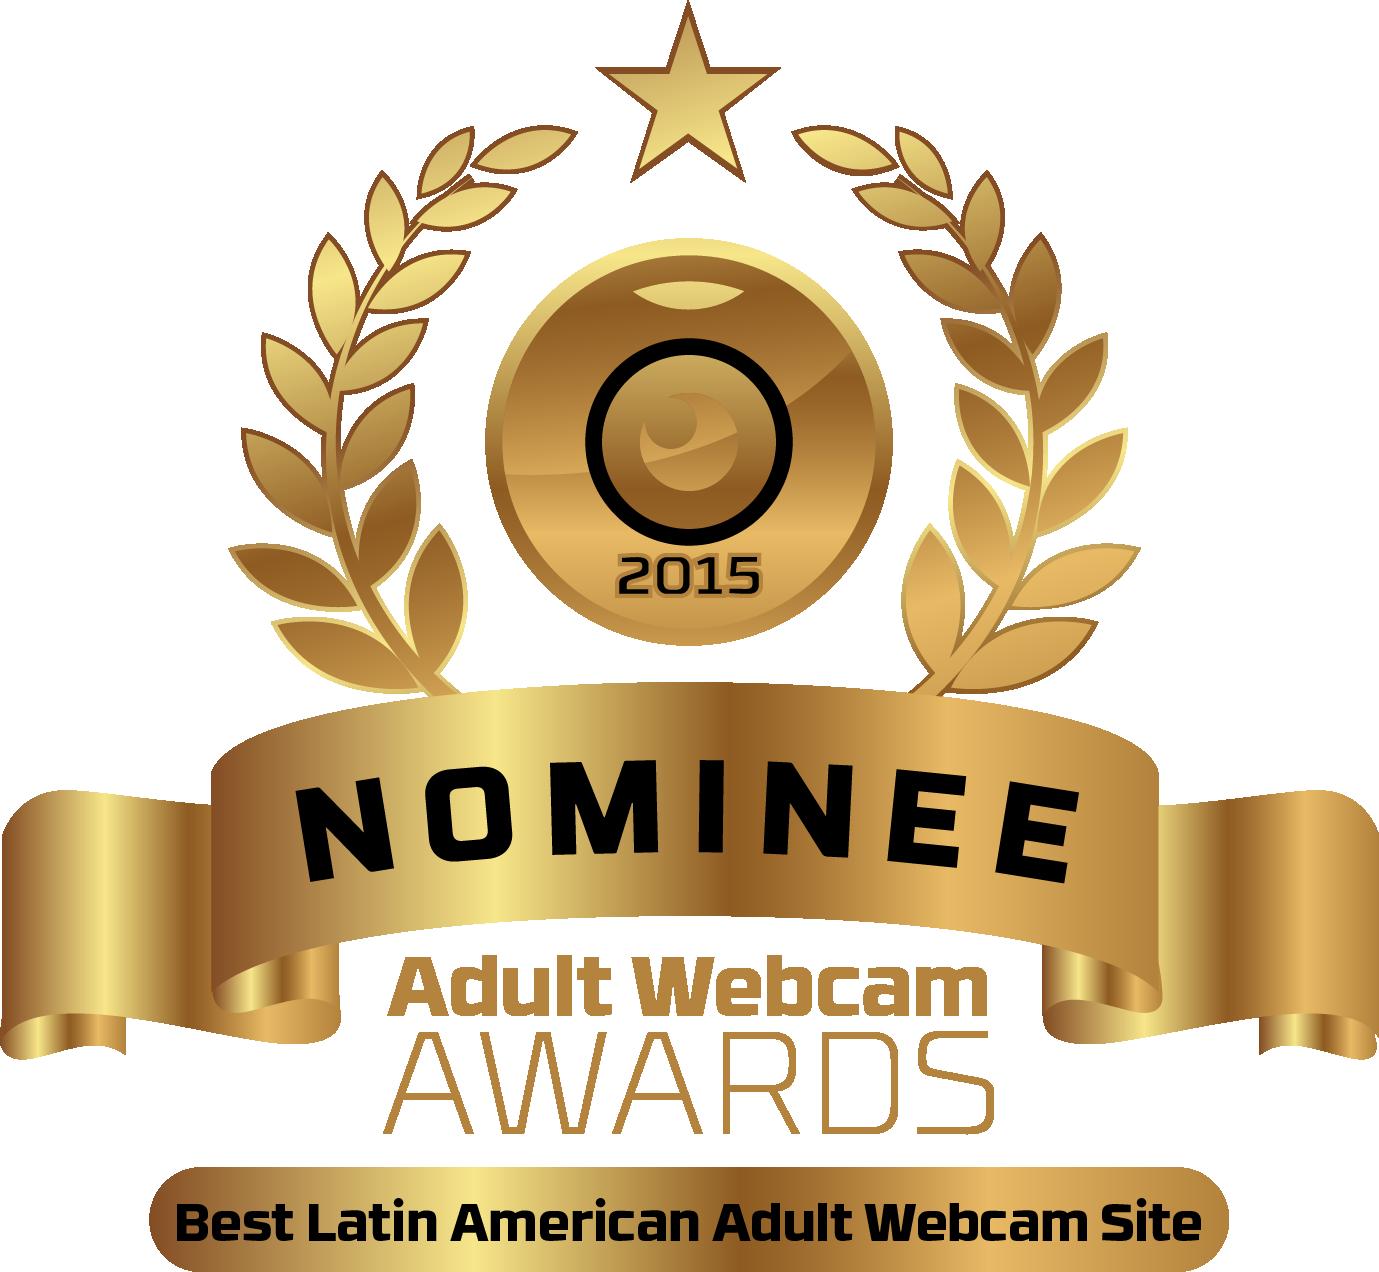 Best Latin American Adult Webcam Site